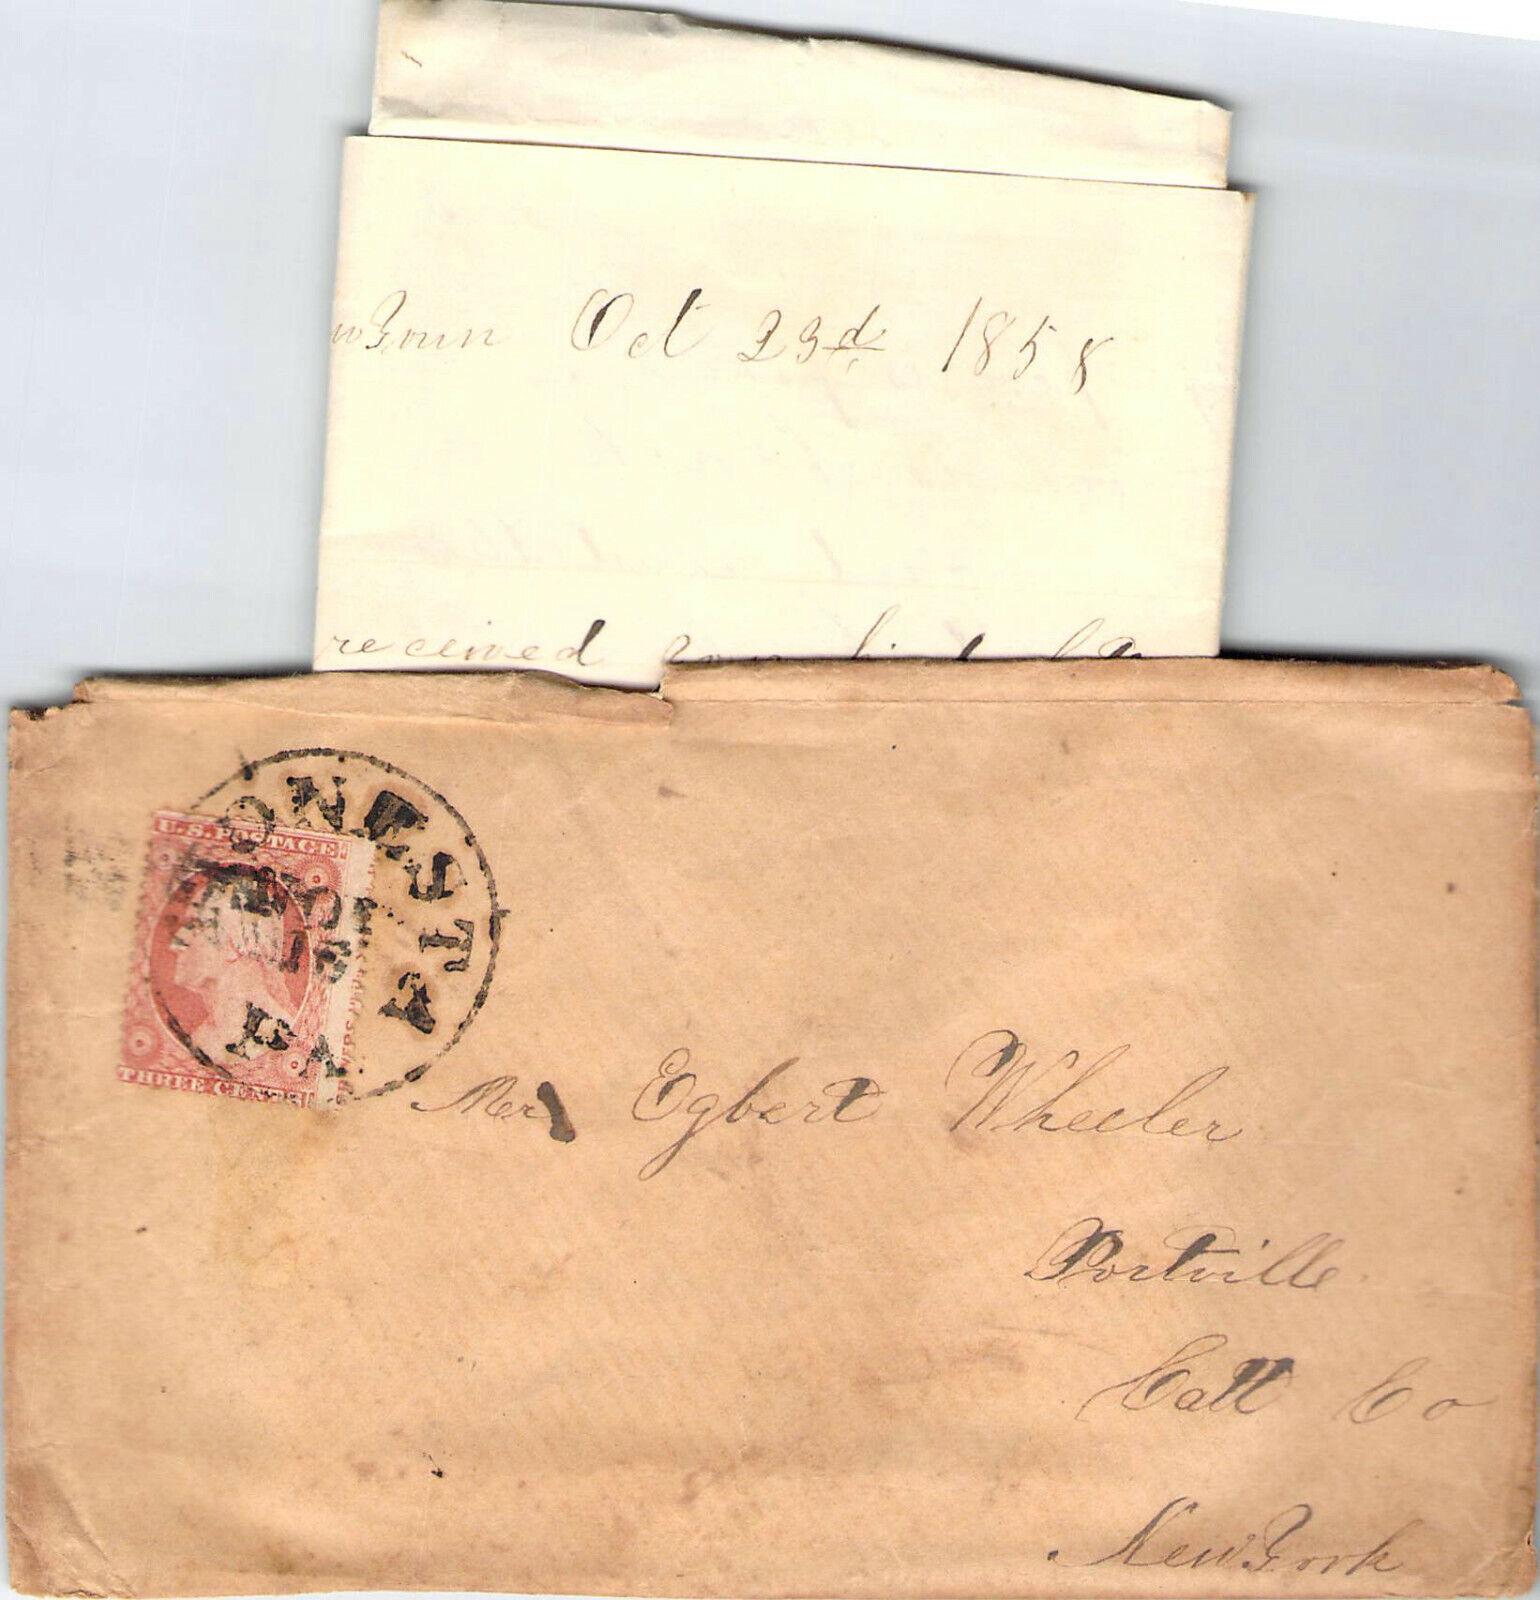 1858 CORRESPONDENCE TIONESTA PA CRAZY COOL CANCEL POSTAL HISTORY